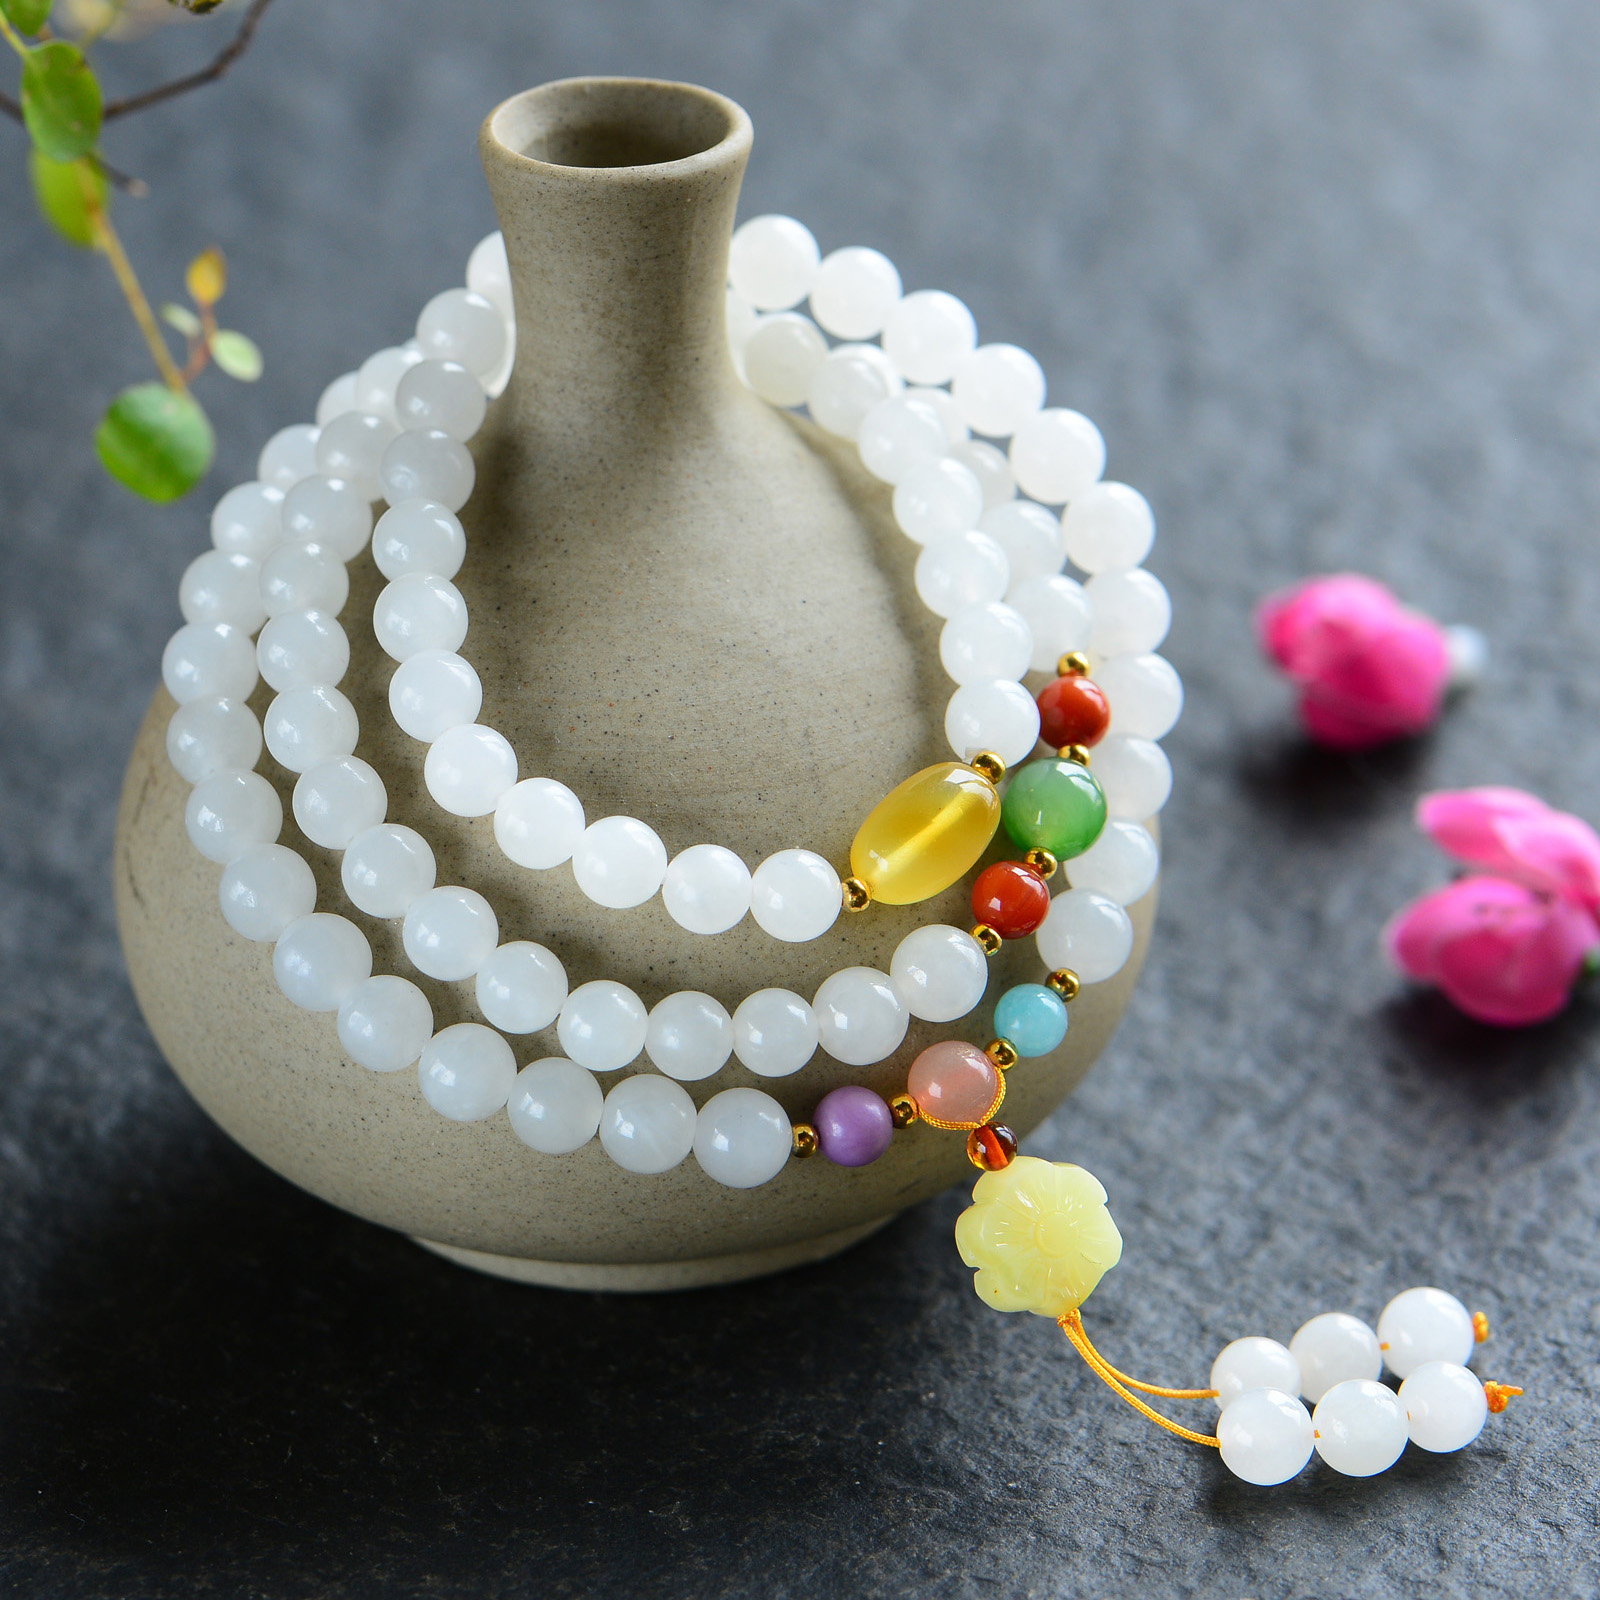 Handmade Authentic Hetian Beads Bracelets 6mm handmade authentic hetian crystal budda bracelets